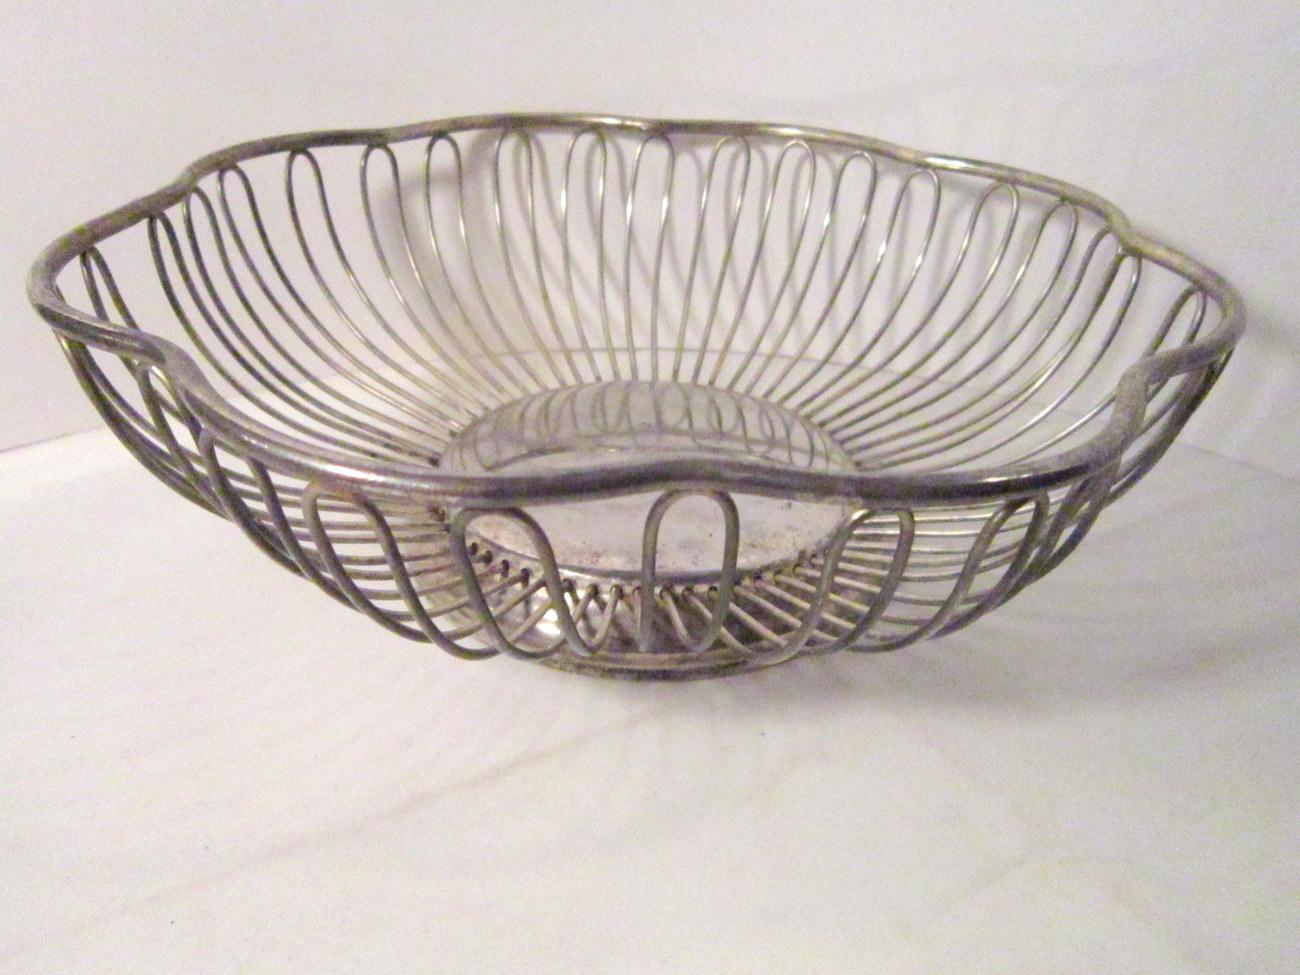 Silverplate Wire Bowl Centerpiece, Bread Basket Vintage Scalloped Rim